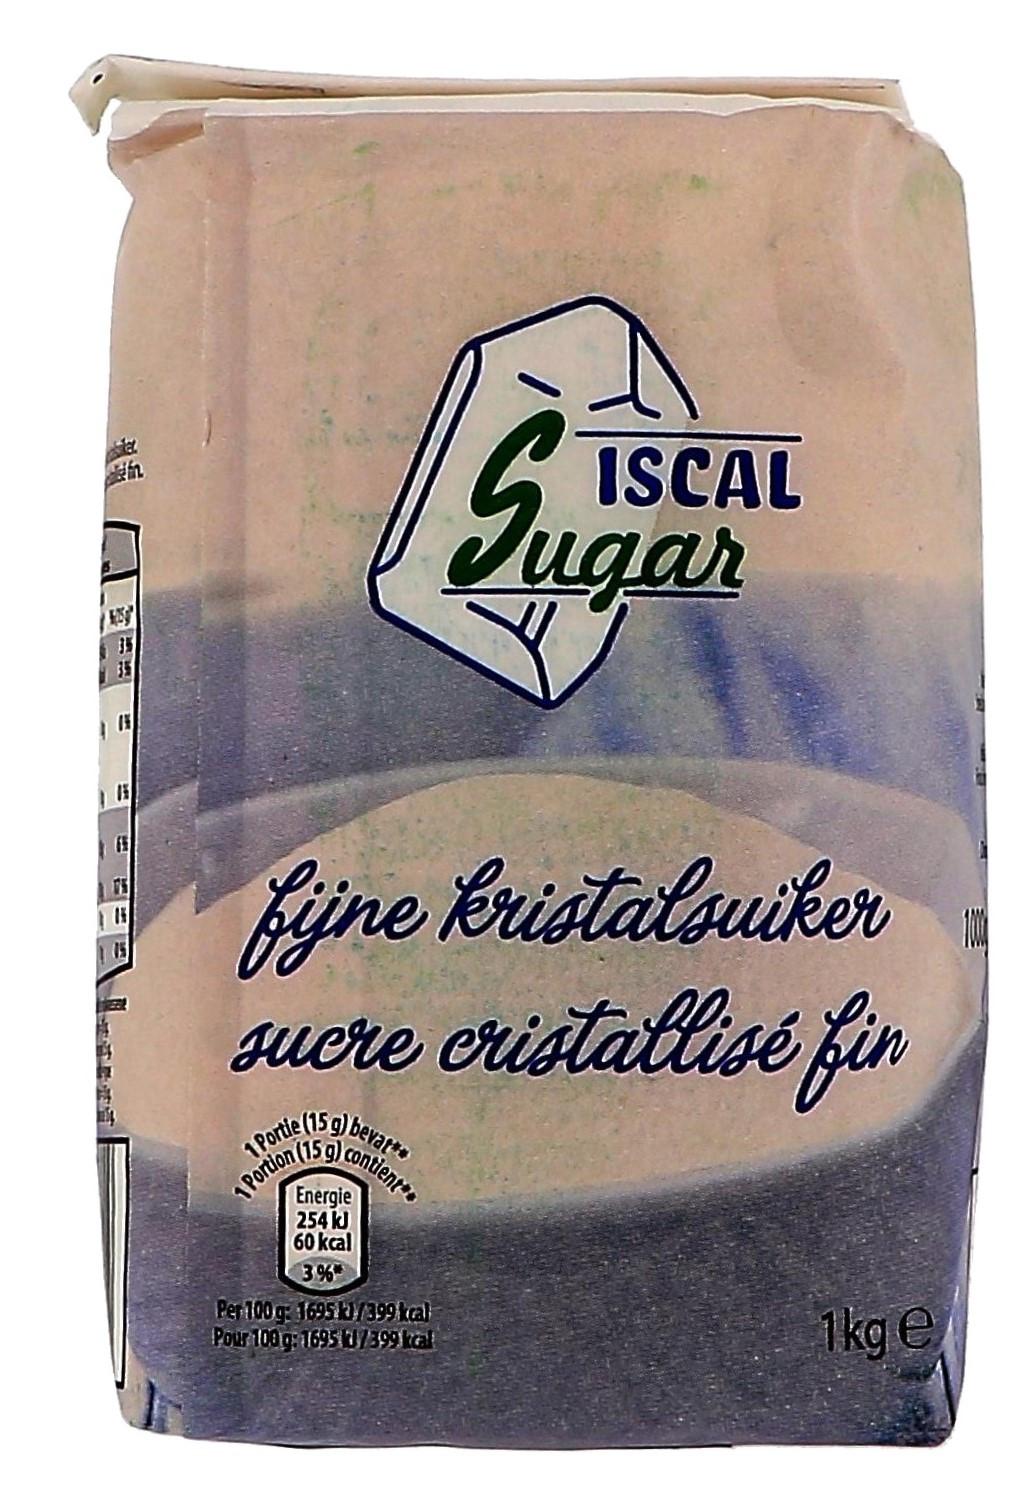 Fijne Kristalsuiker 1kg Iscal Sugar (Suiker)